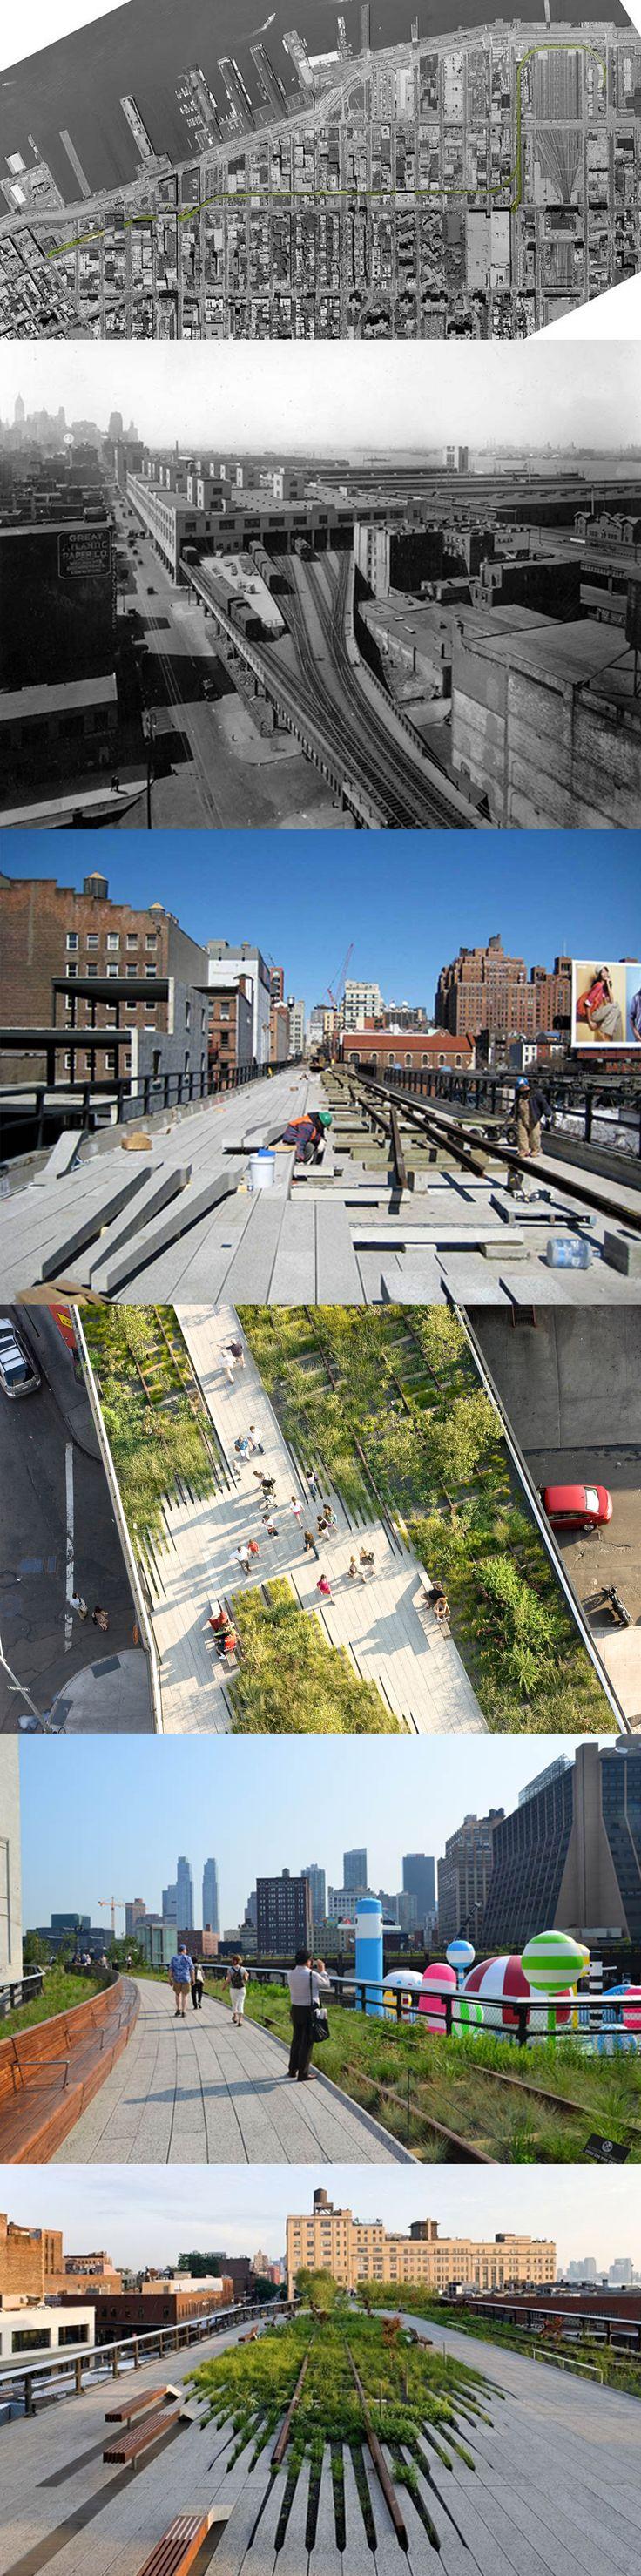 New York_The High Line #TheHighLine #NewYork #ParkinTheSky  #Parco #Architetto #stella #fazio